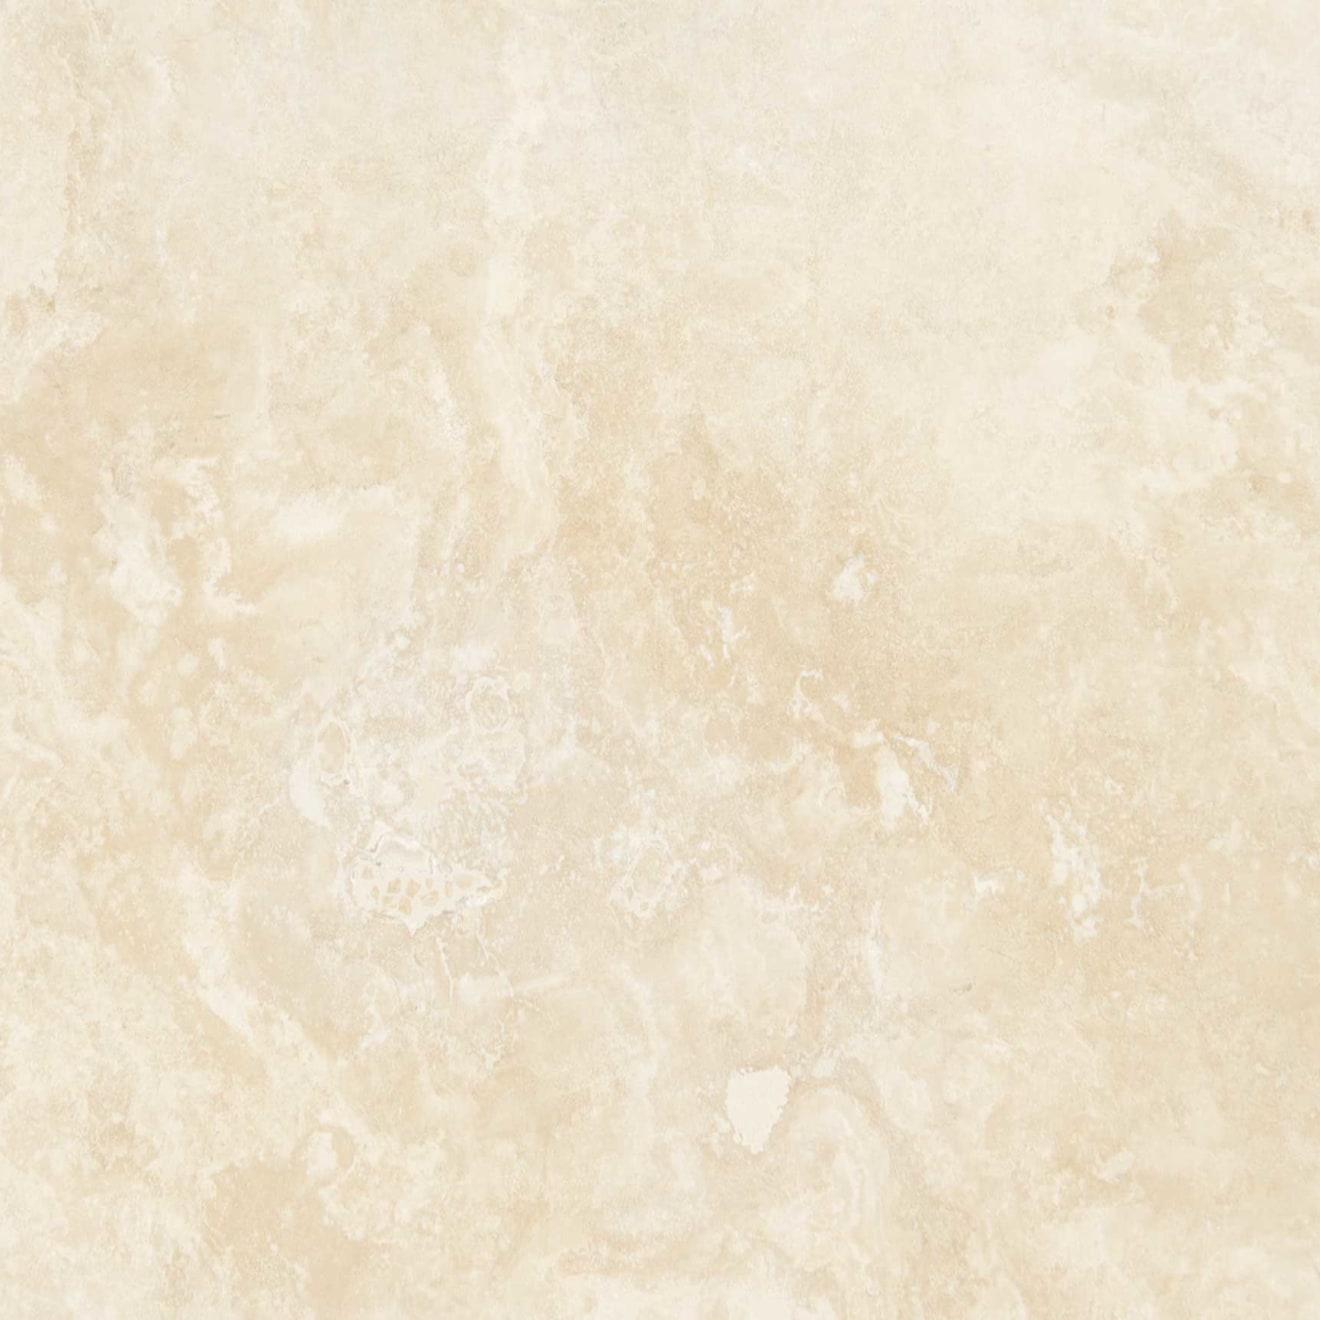 Torreon Travertine In 2 Cm Bedrosians Tile Amp Stone